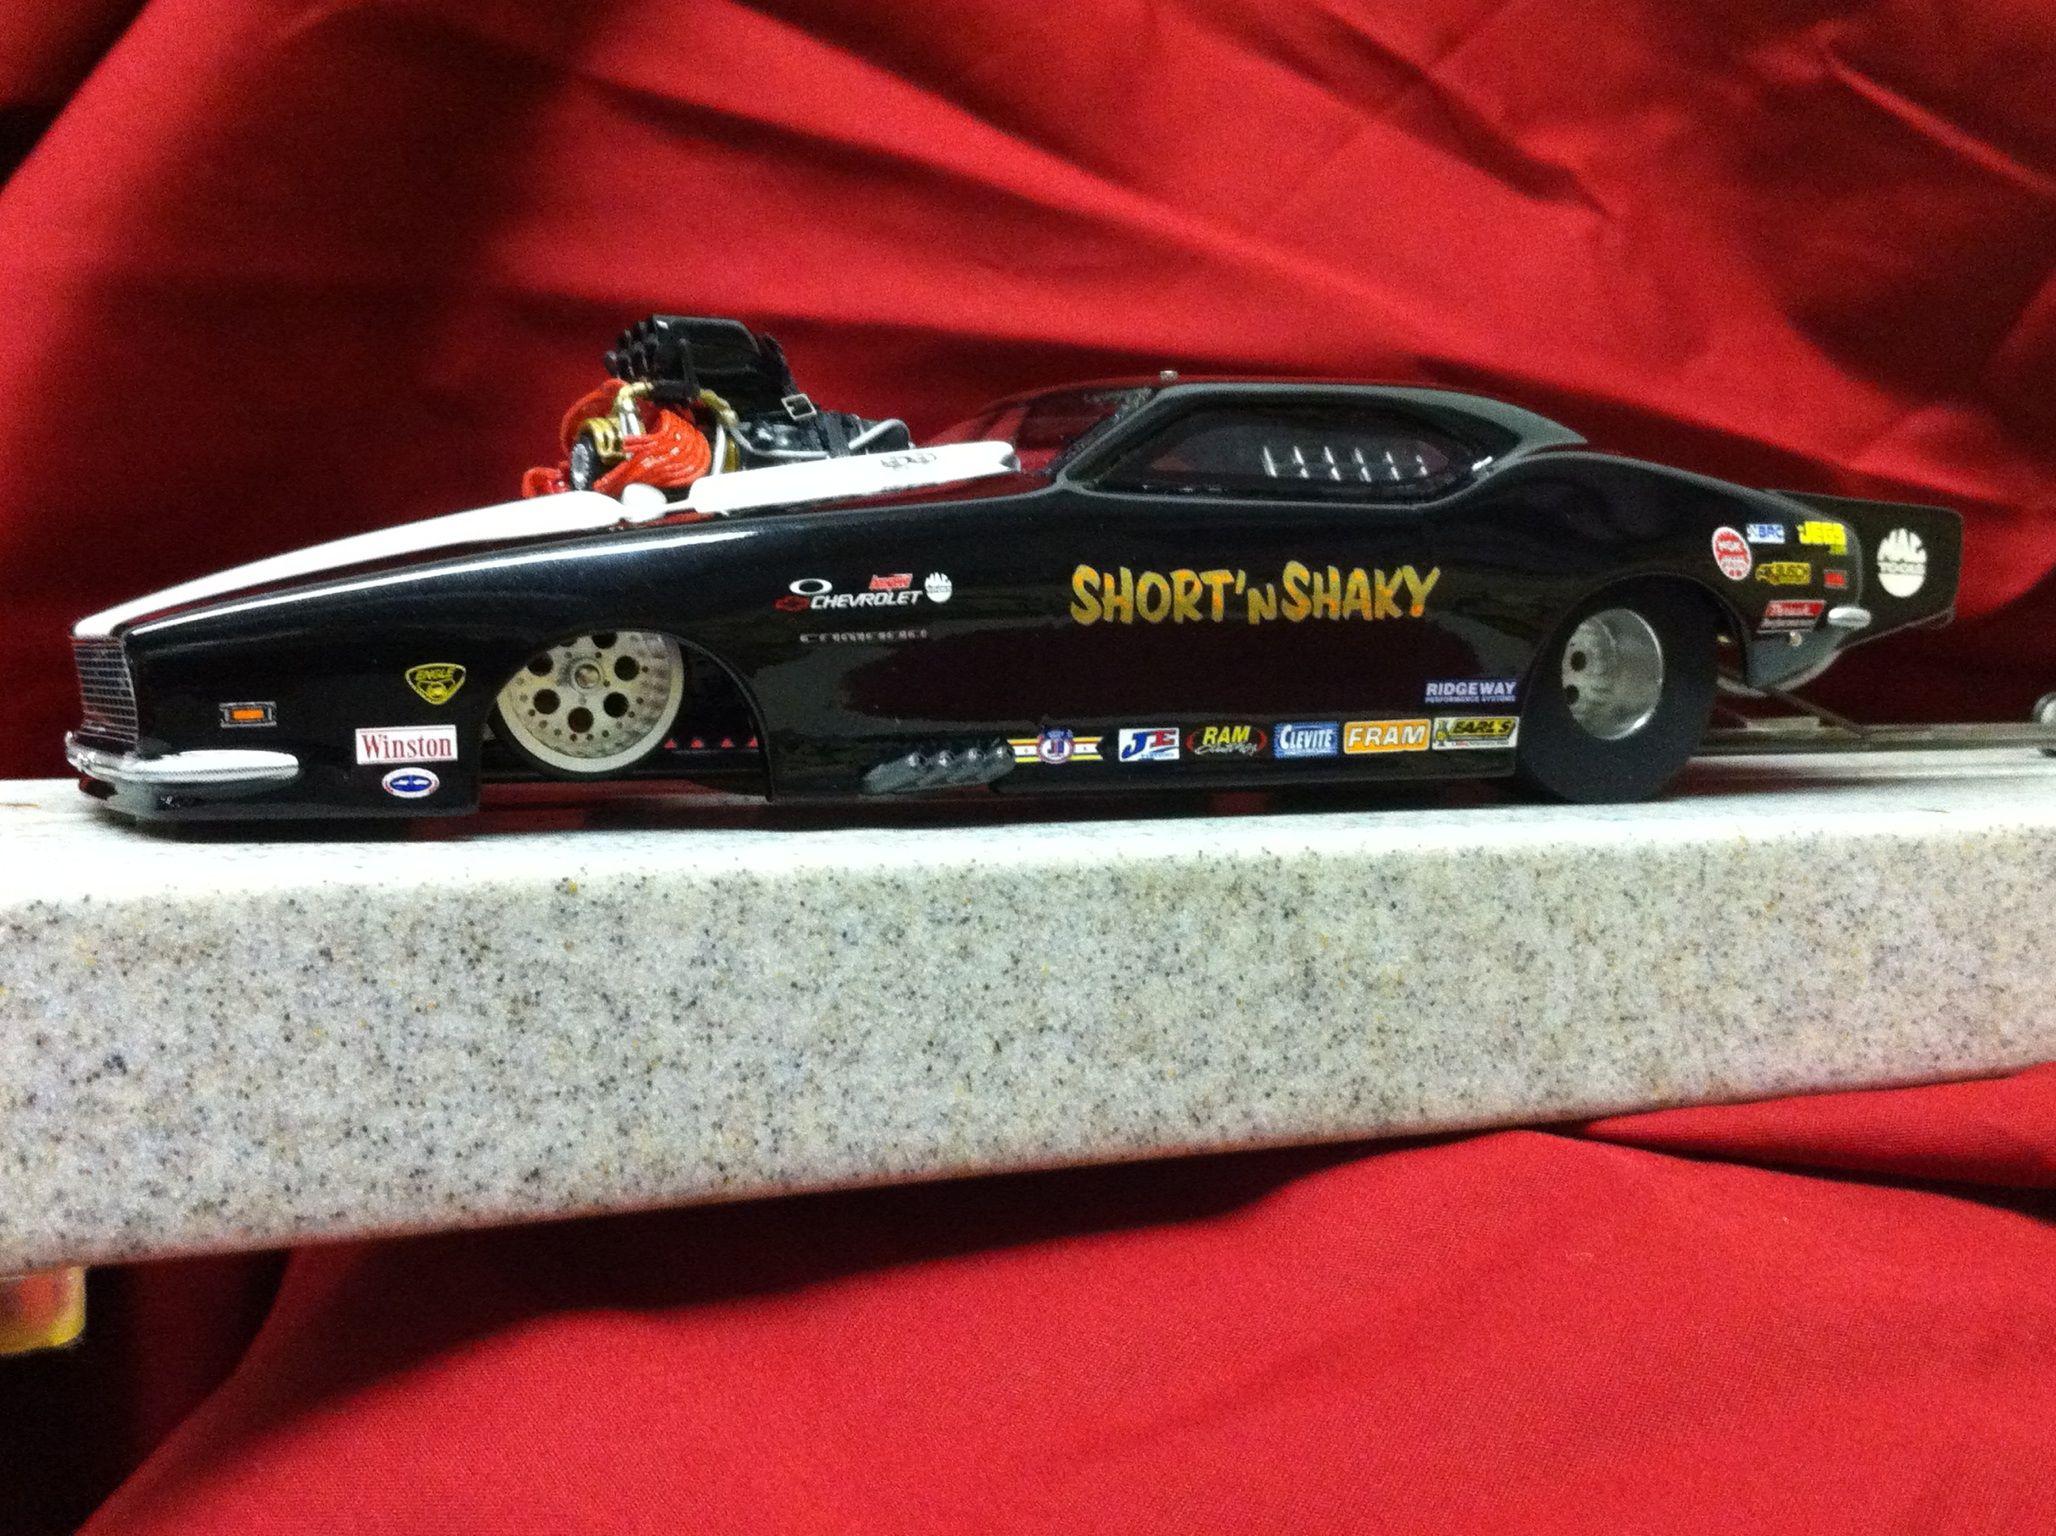 1 24 Scale Resin Drag Slot Car Slot Car Drag Racing Slot Cars Slot Car Tracks